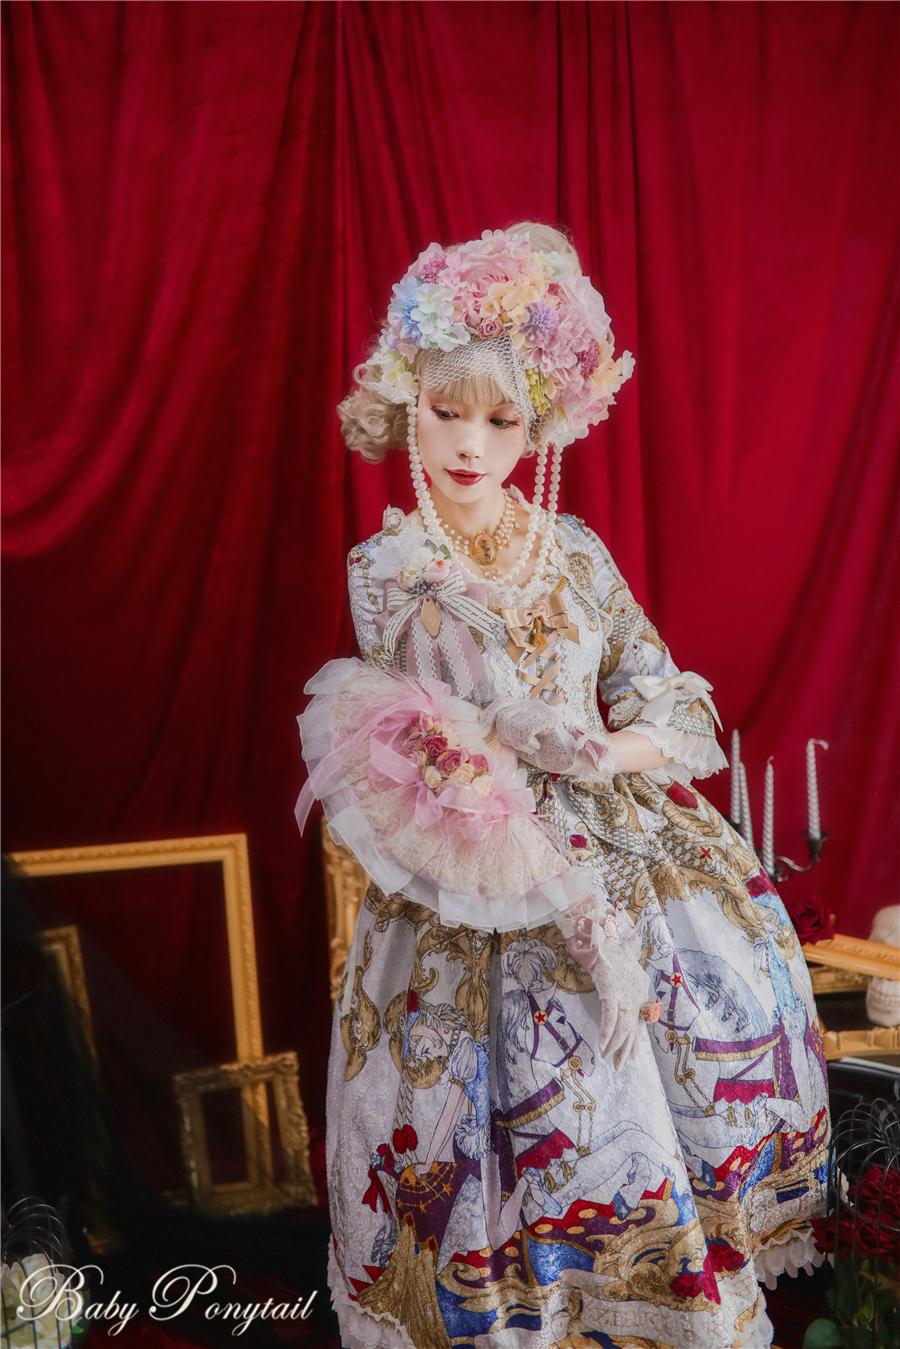 Baby Ponytail_Circus Princess_Silver OP_Kaka_15.jpg